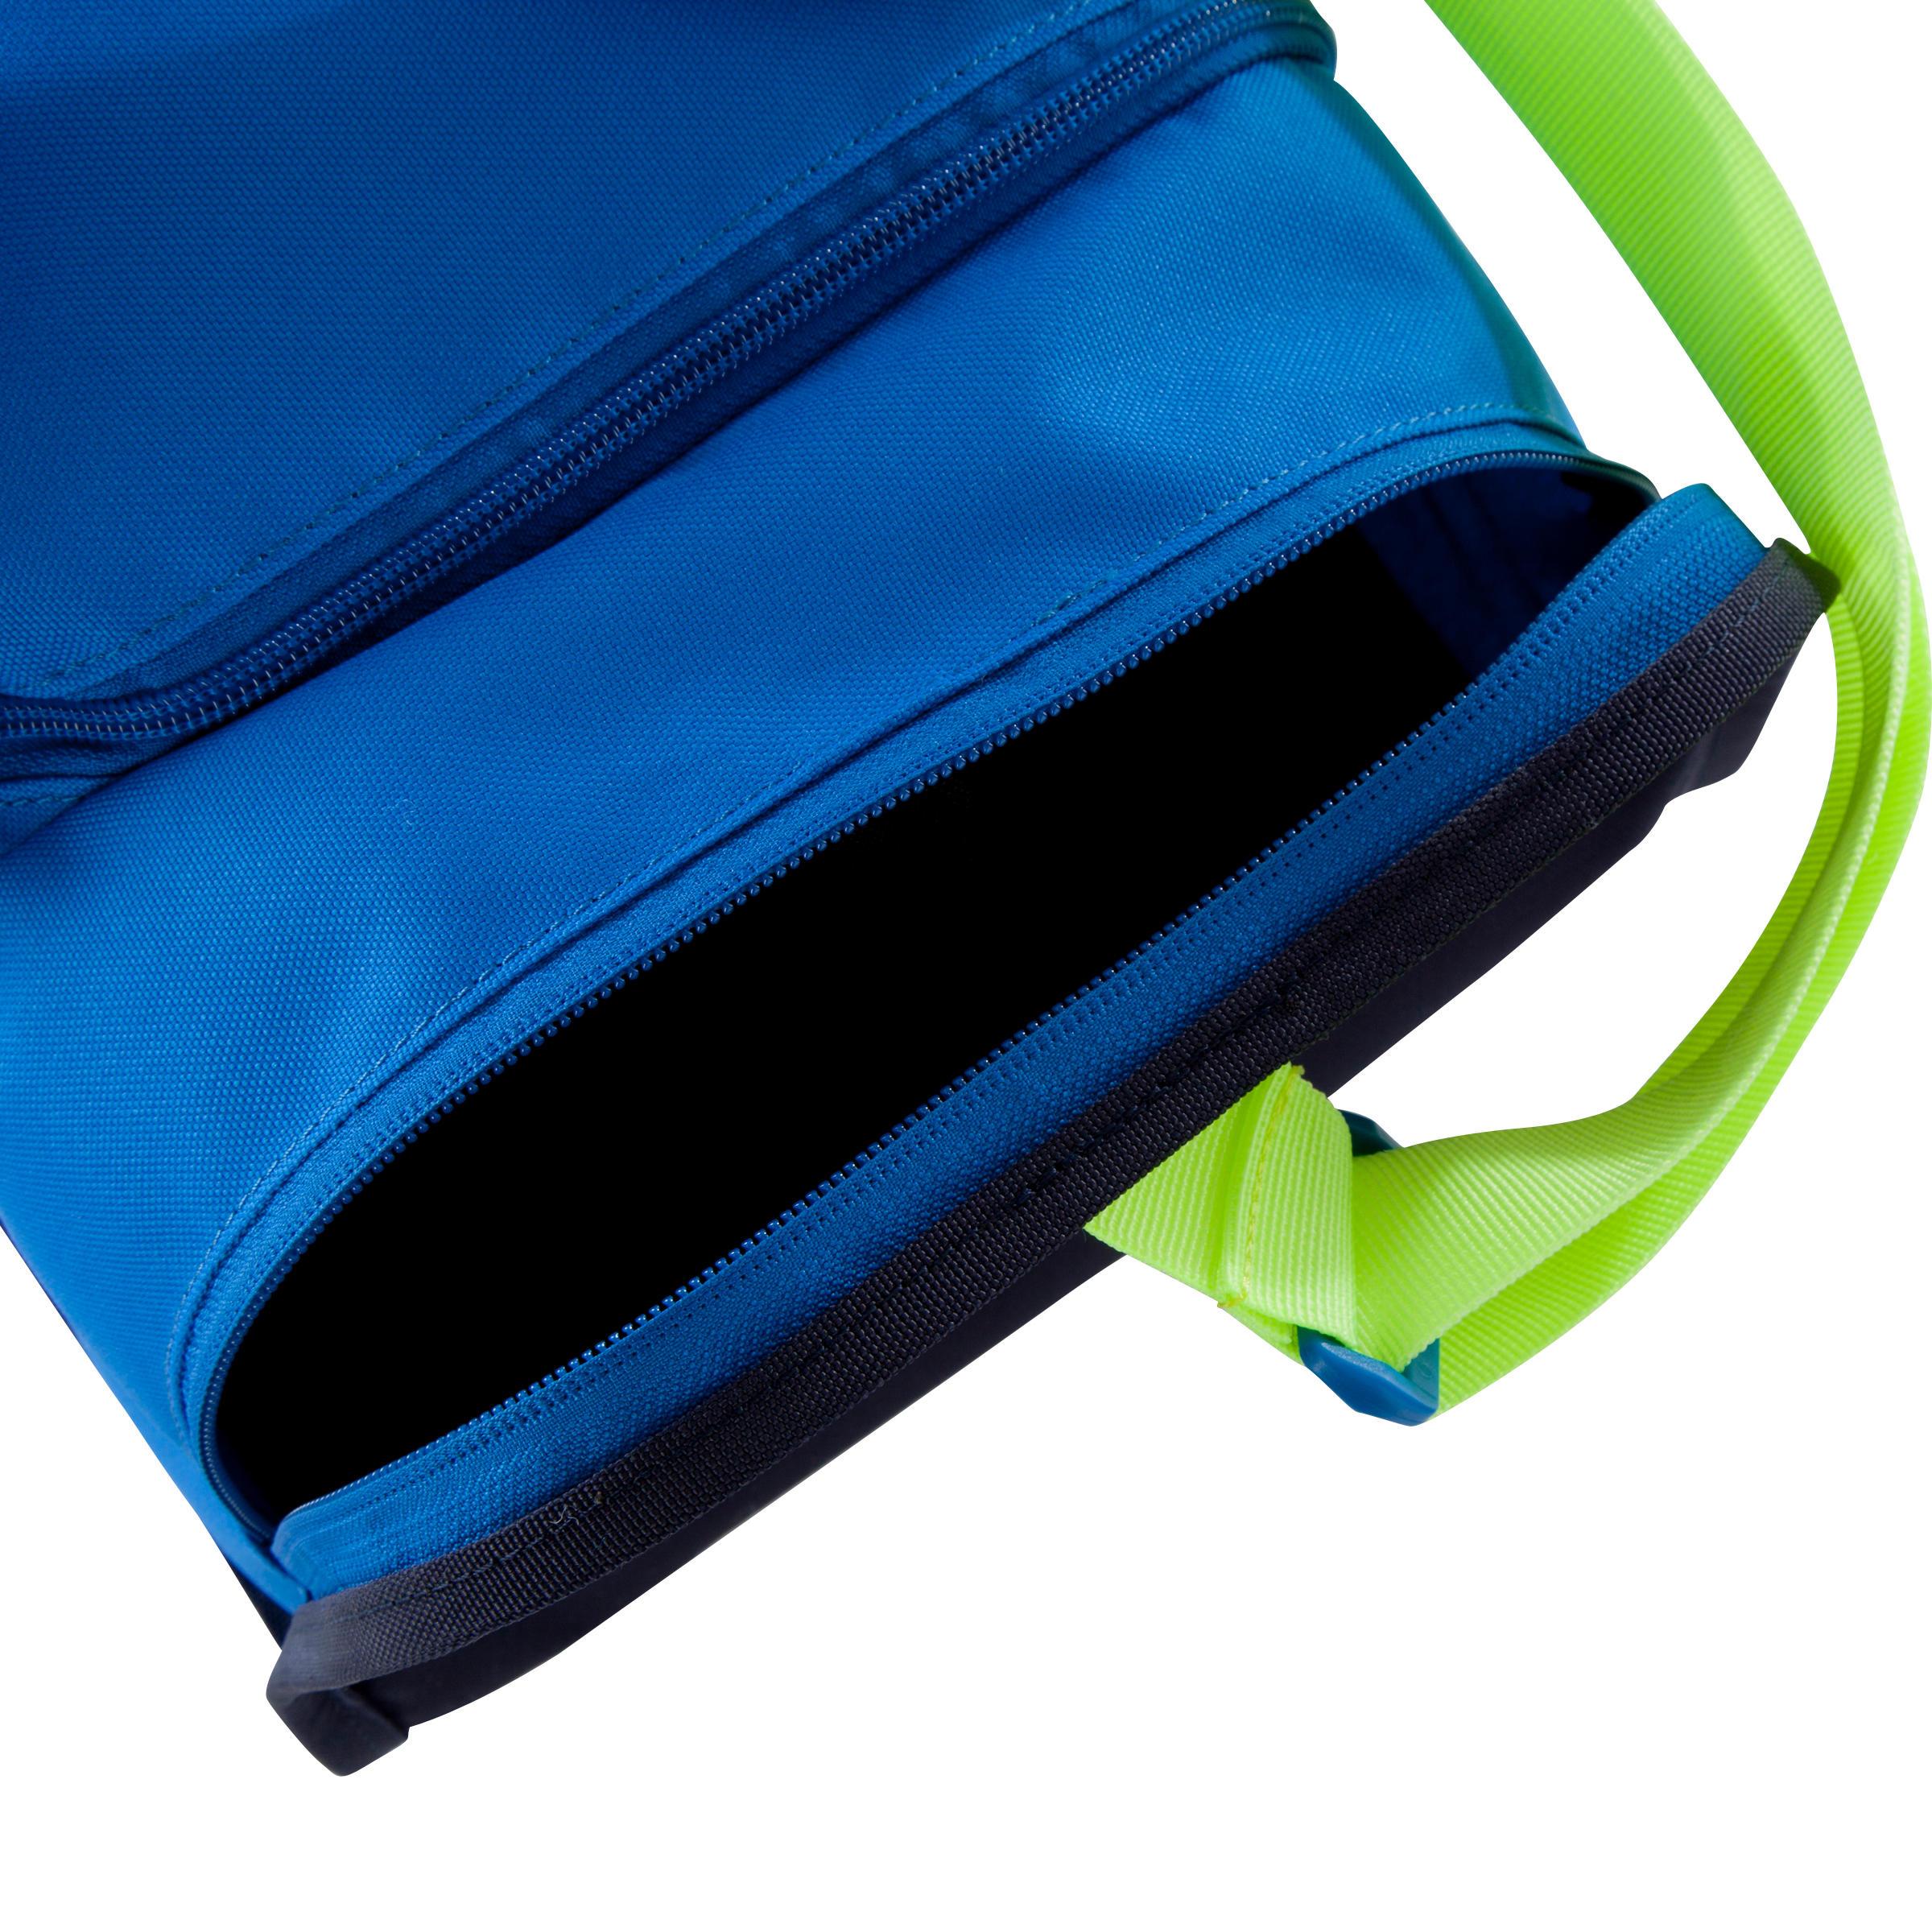 Kipocket Team Sports Bag 20 Litres - Blue/Yellow